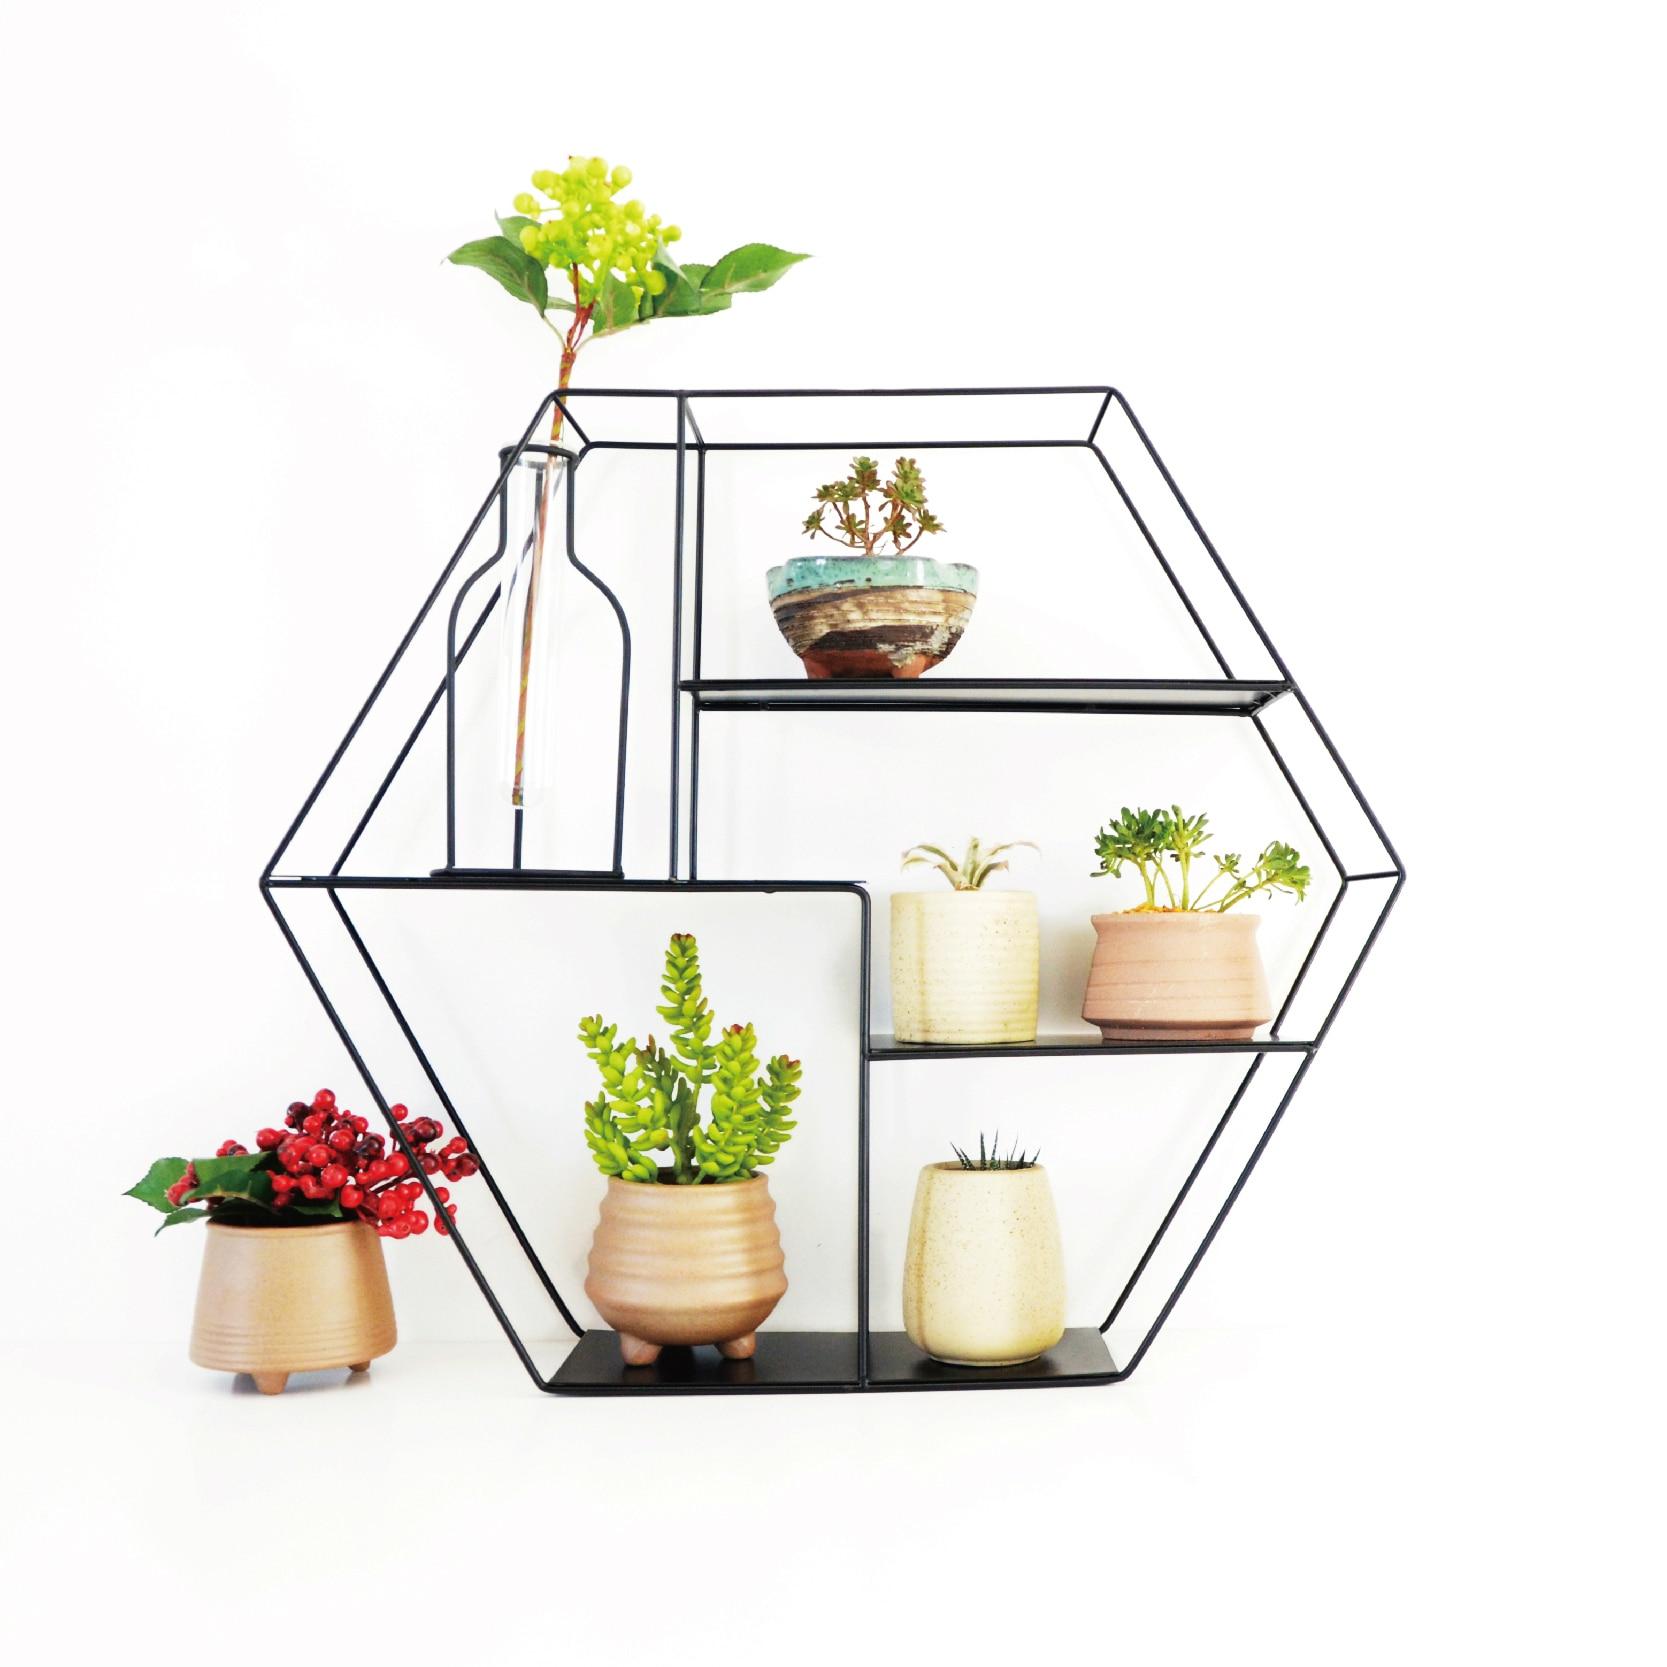 combination alibaba succulents metal rack hanging wall outdoor iron group item on balcony multilayer aliexpress com shelf indoor pot